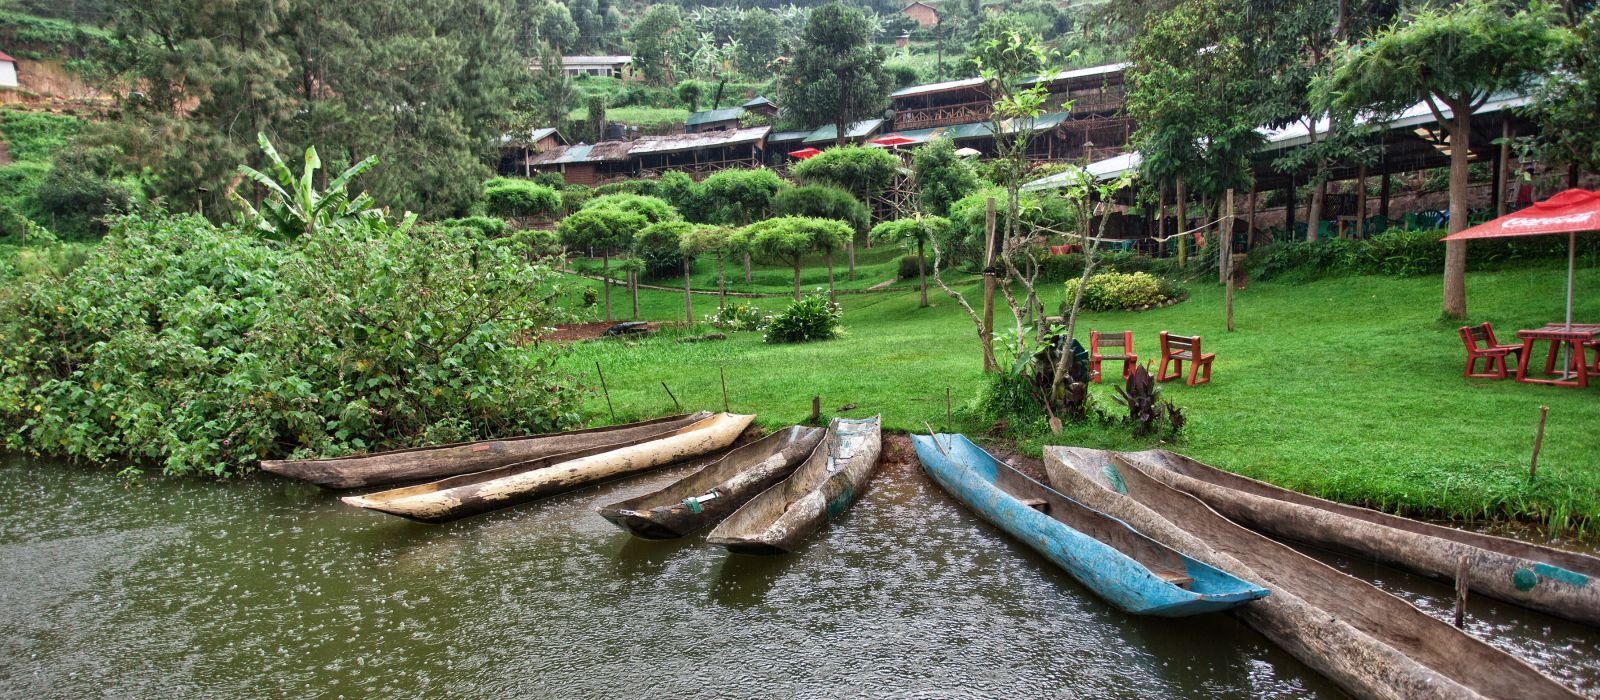 Traditional boats at Lake Bunyonyi in Uganda, Africa